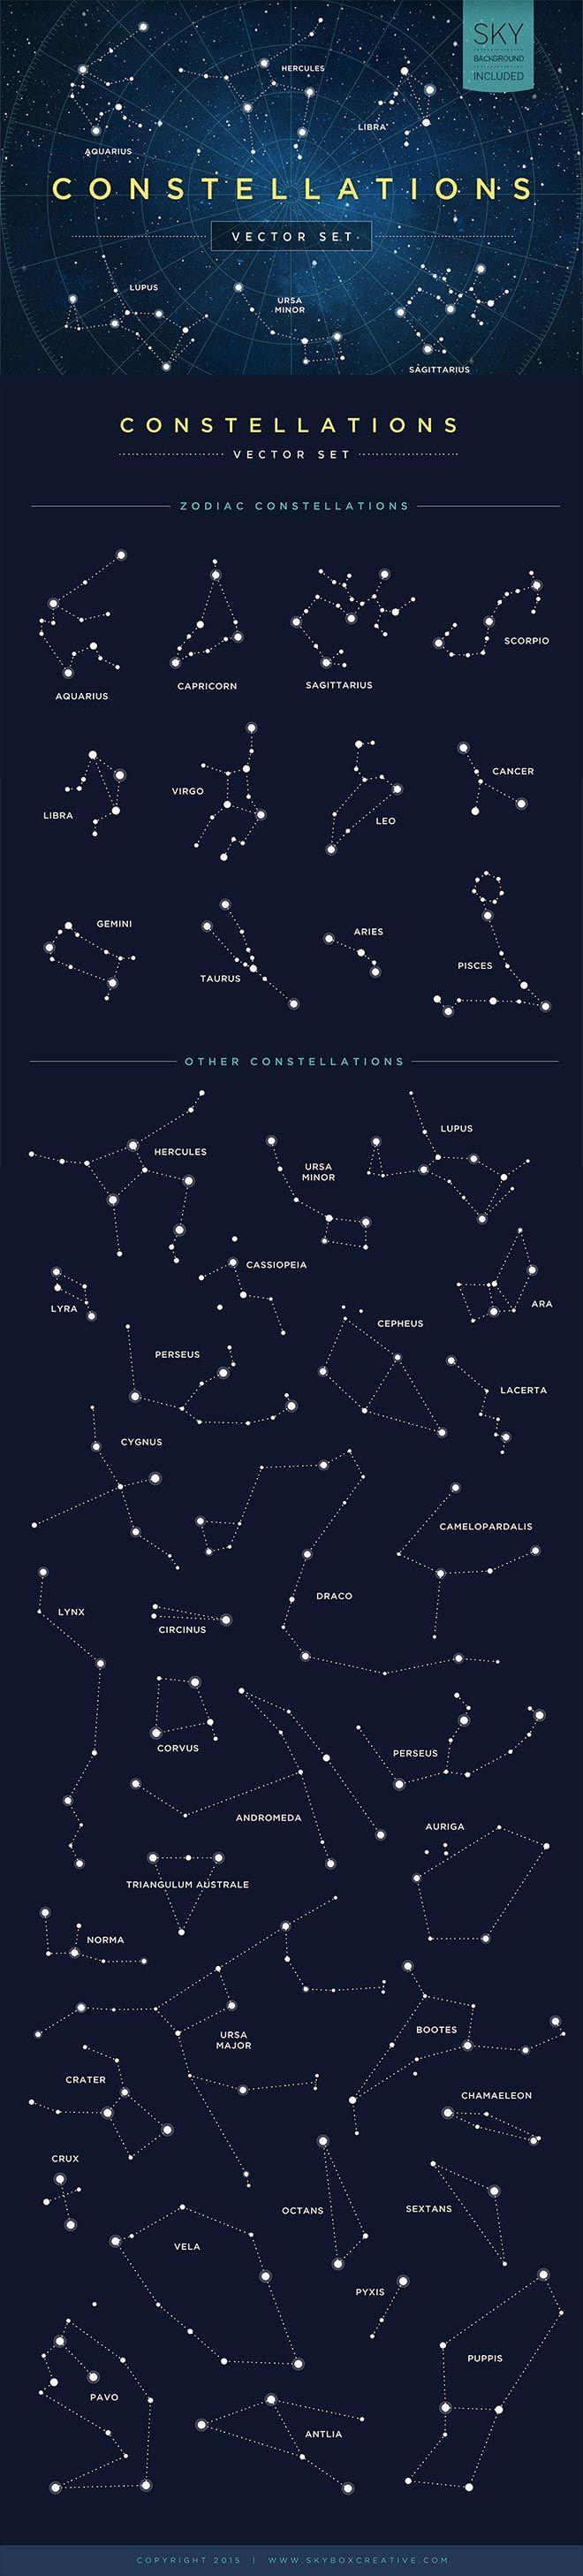 Constellations Vector Set